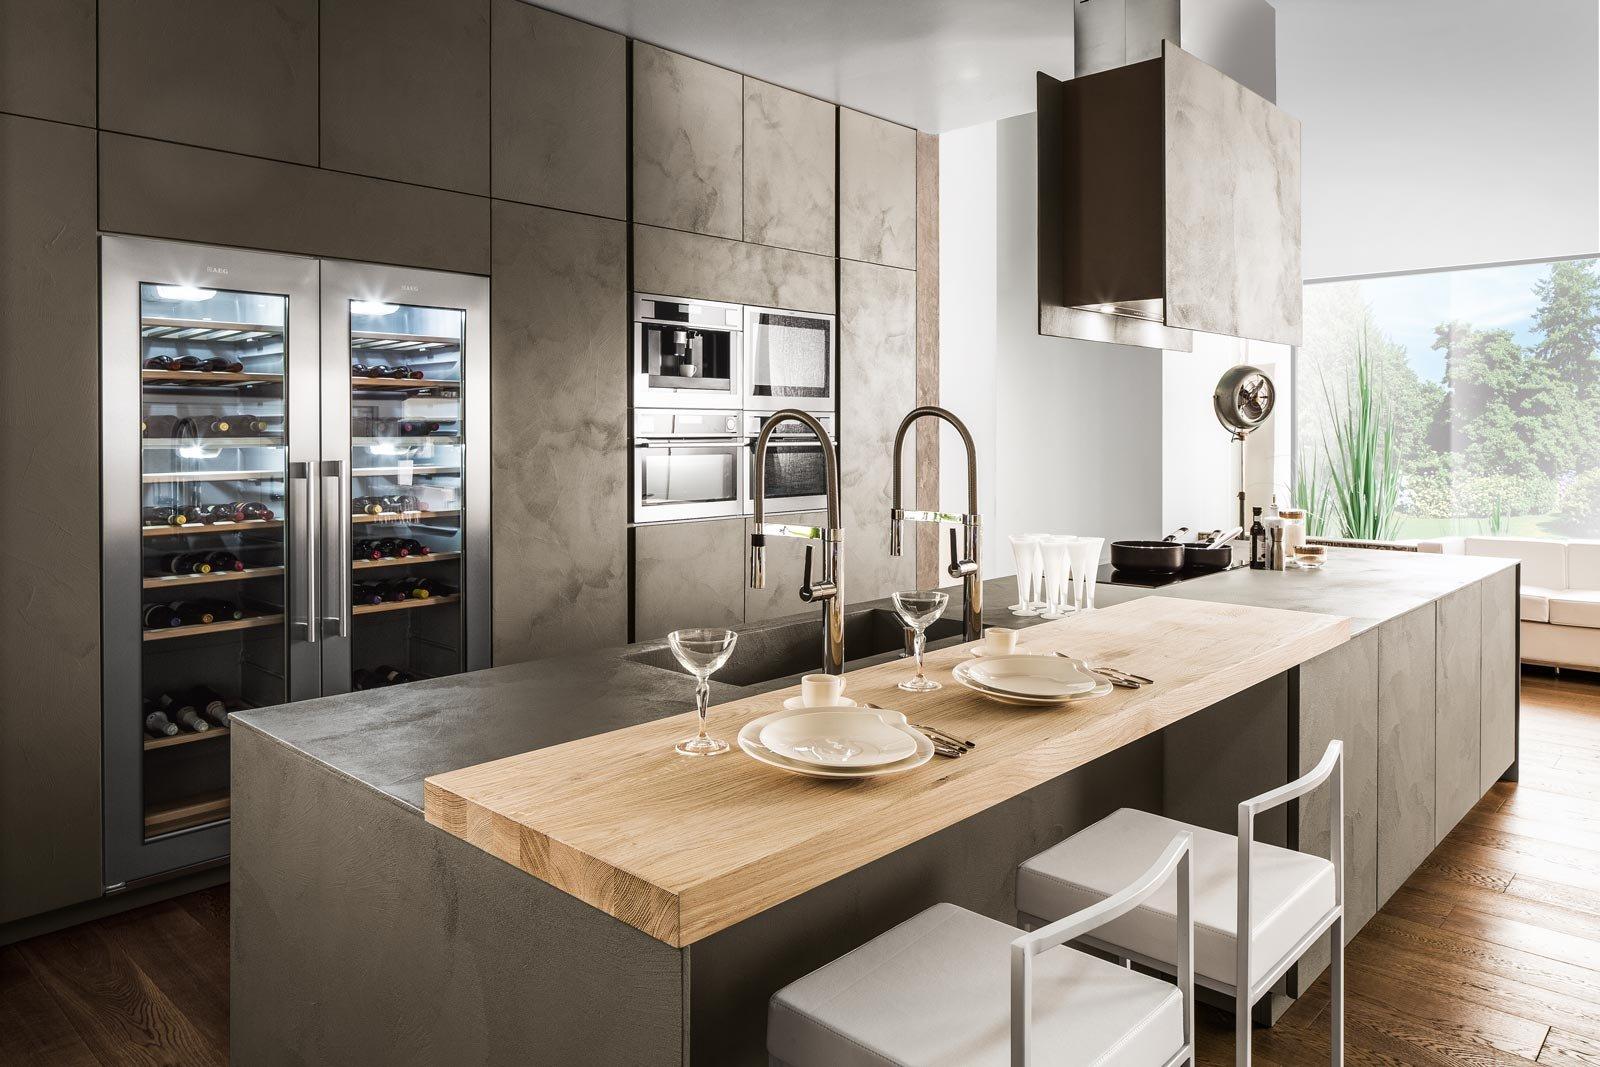 Eurocucina 2016 superfici soft touch per le nuove cucine for Cucine immagini